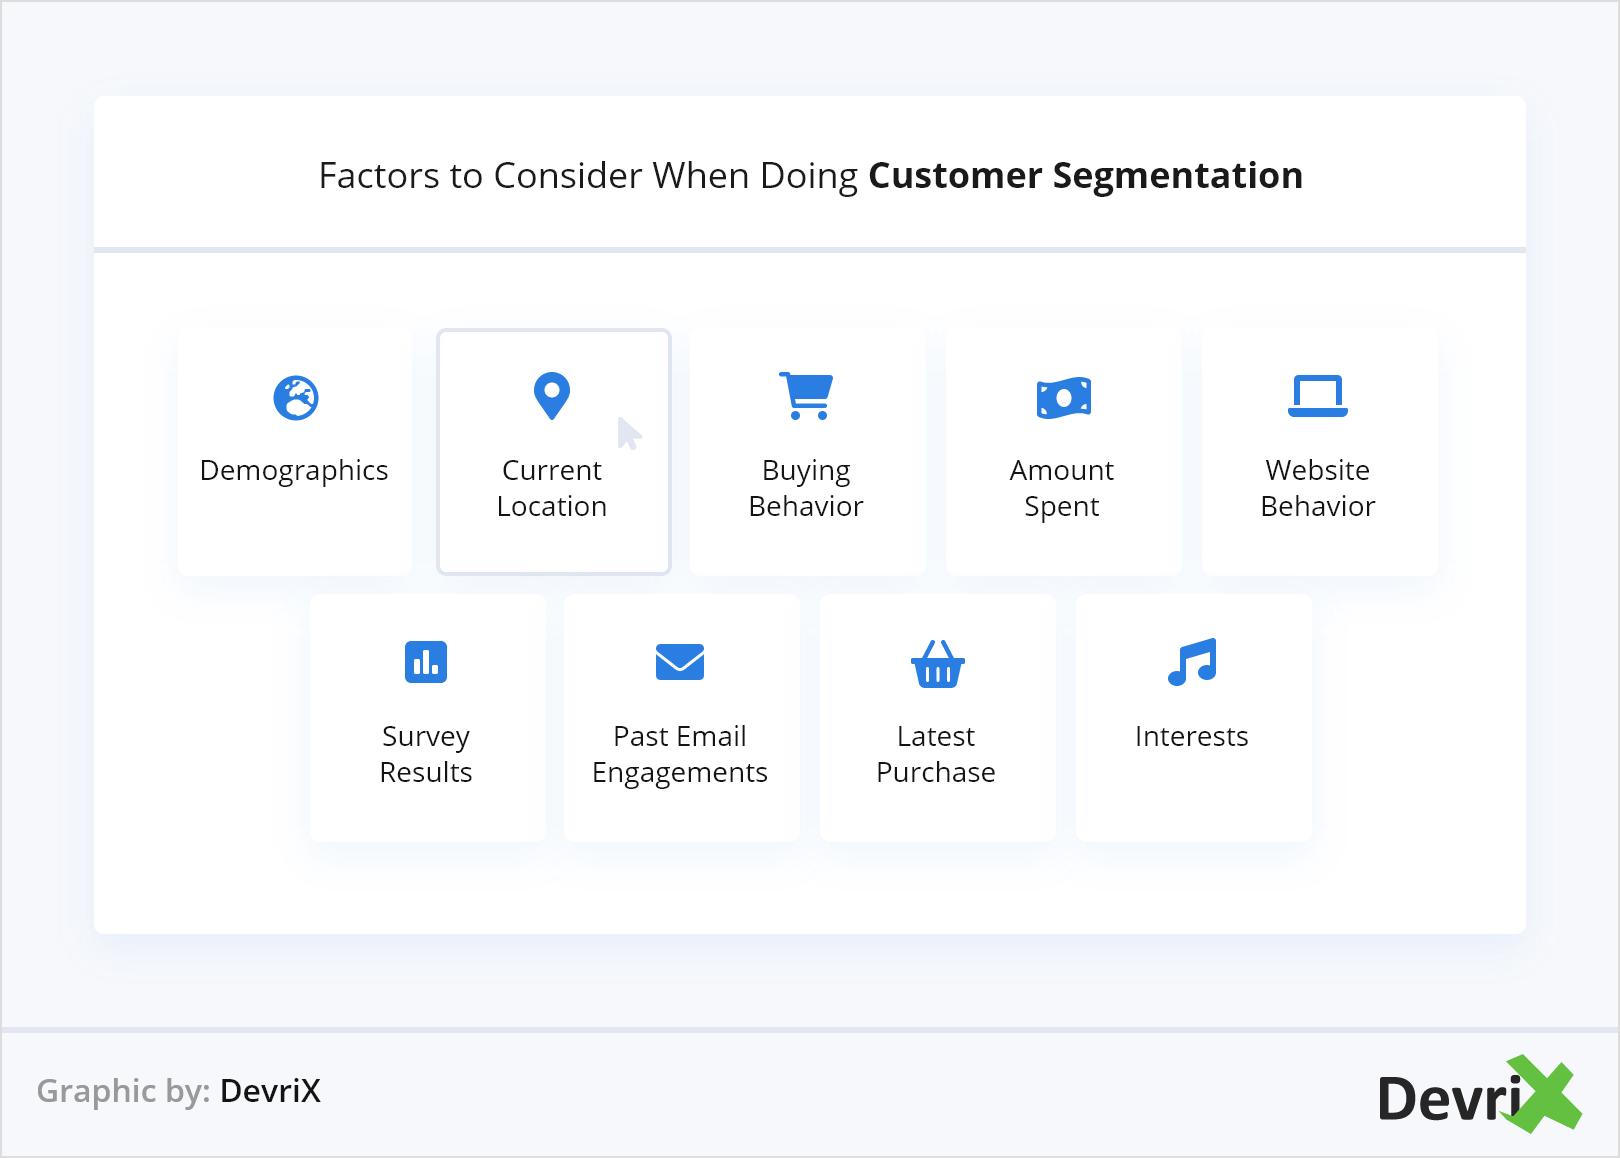 Factors to Consider When Doing Customer Segmentation